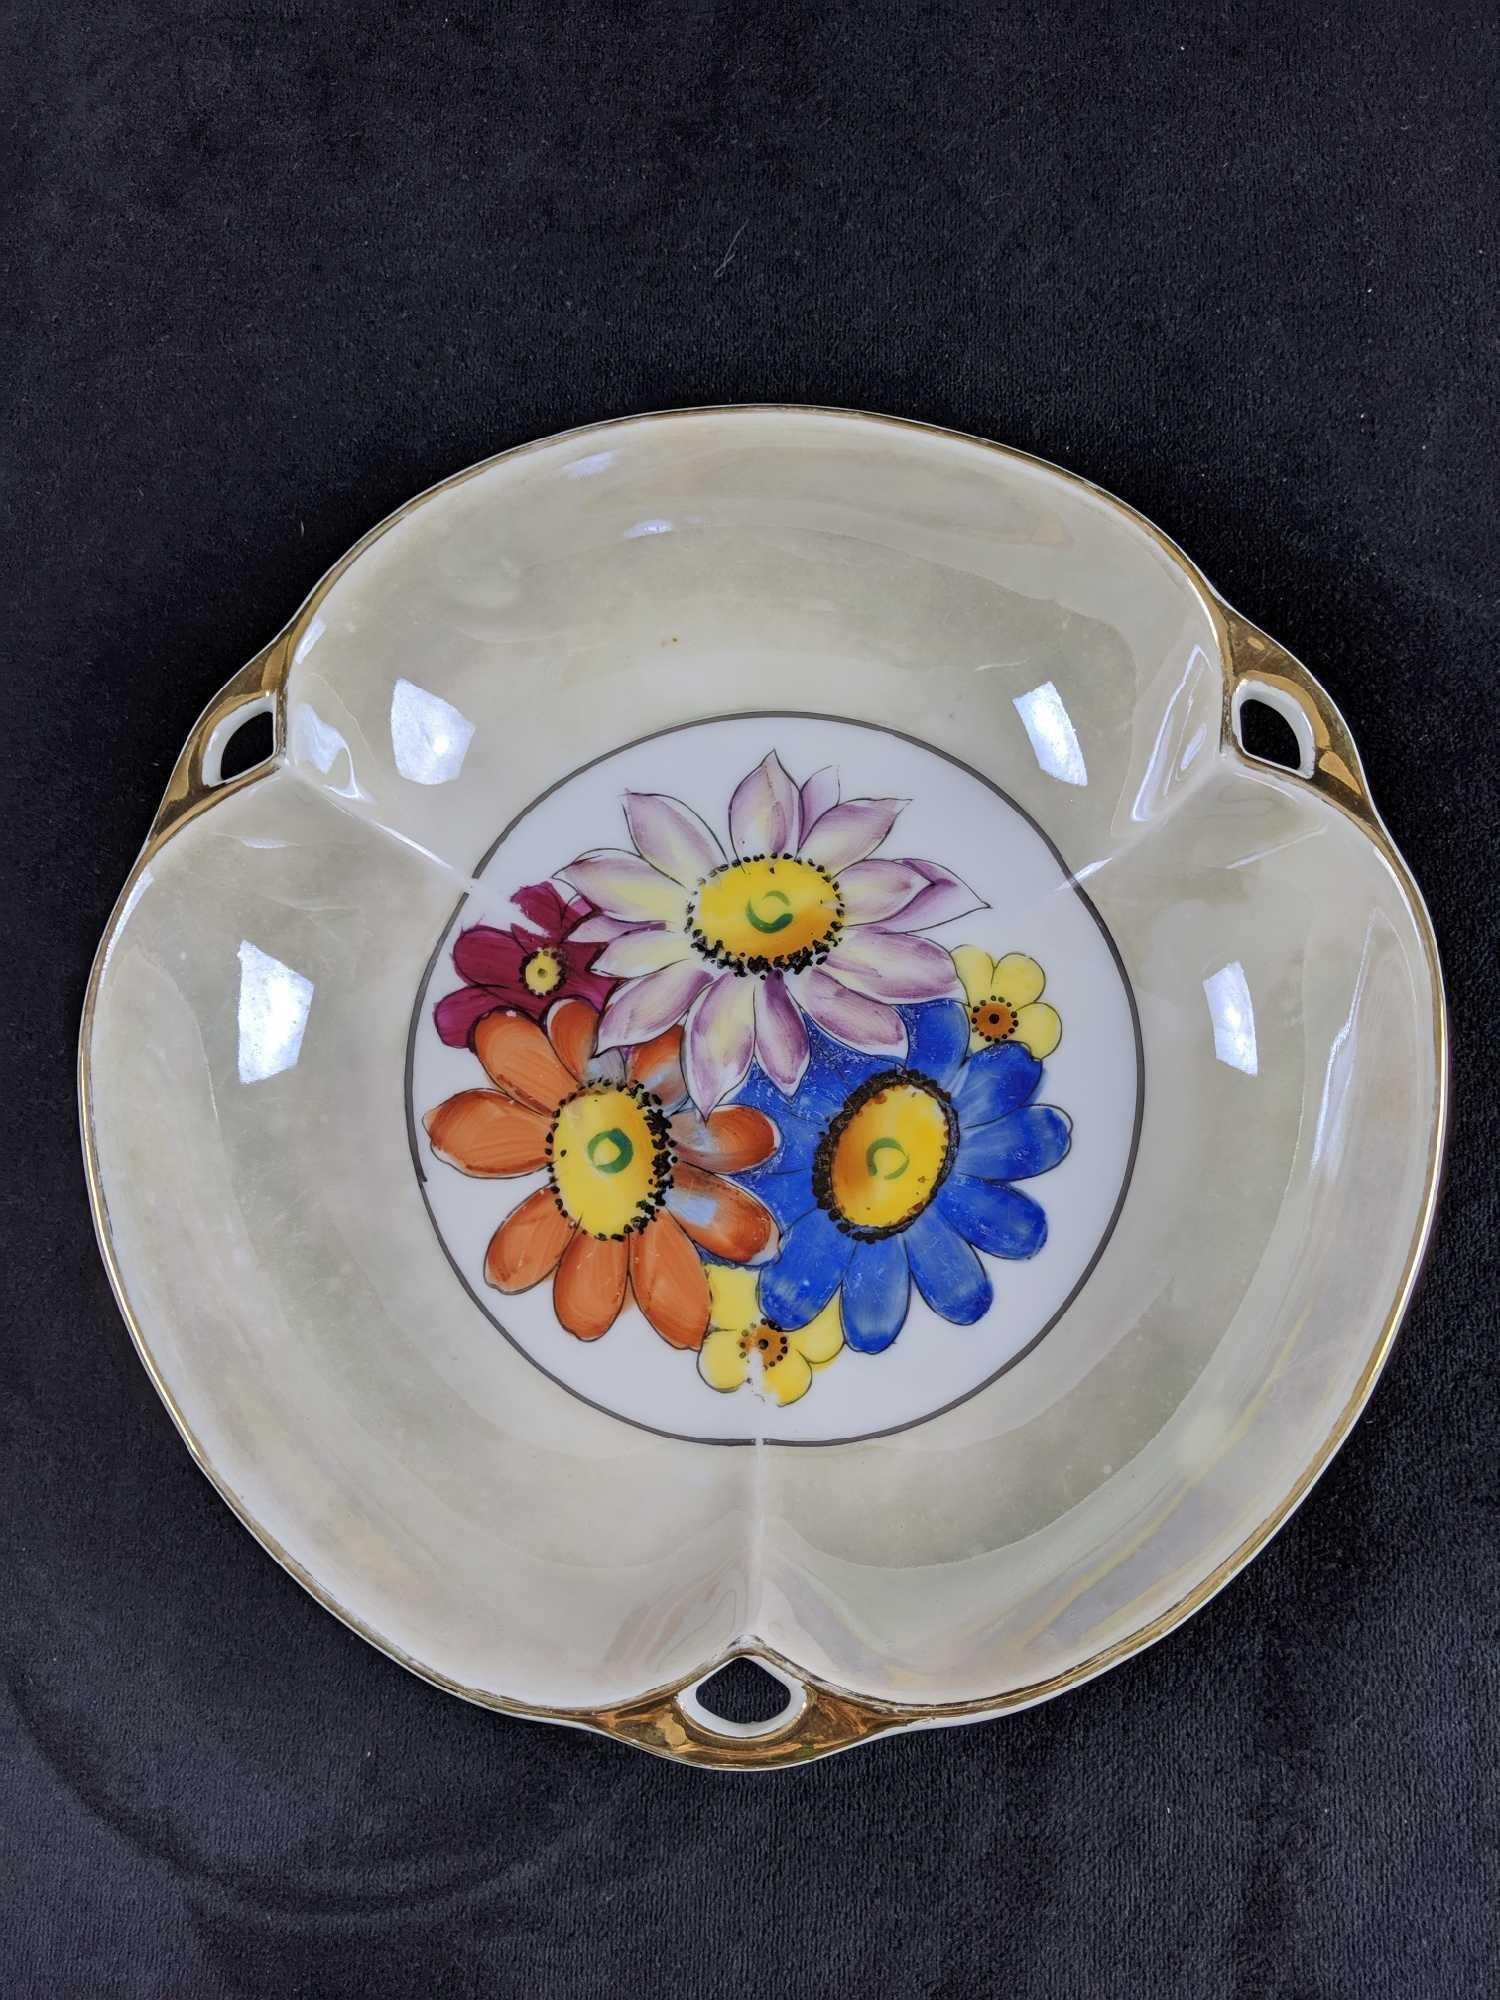 Vintage Japanese Porcelain Noritake Decorative Dish